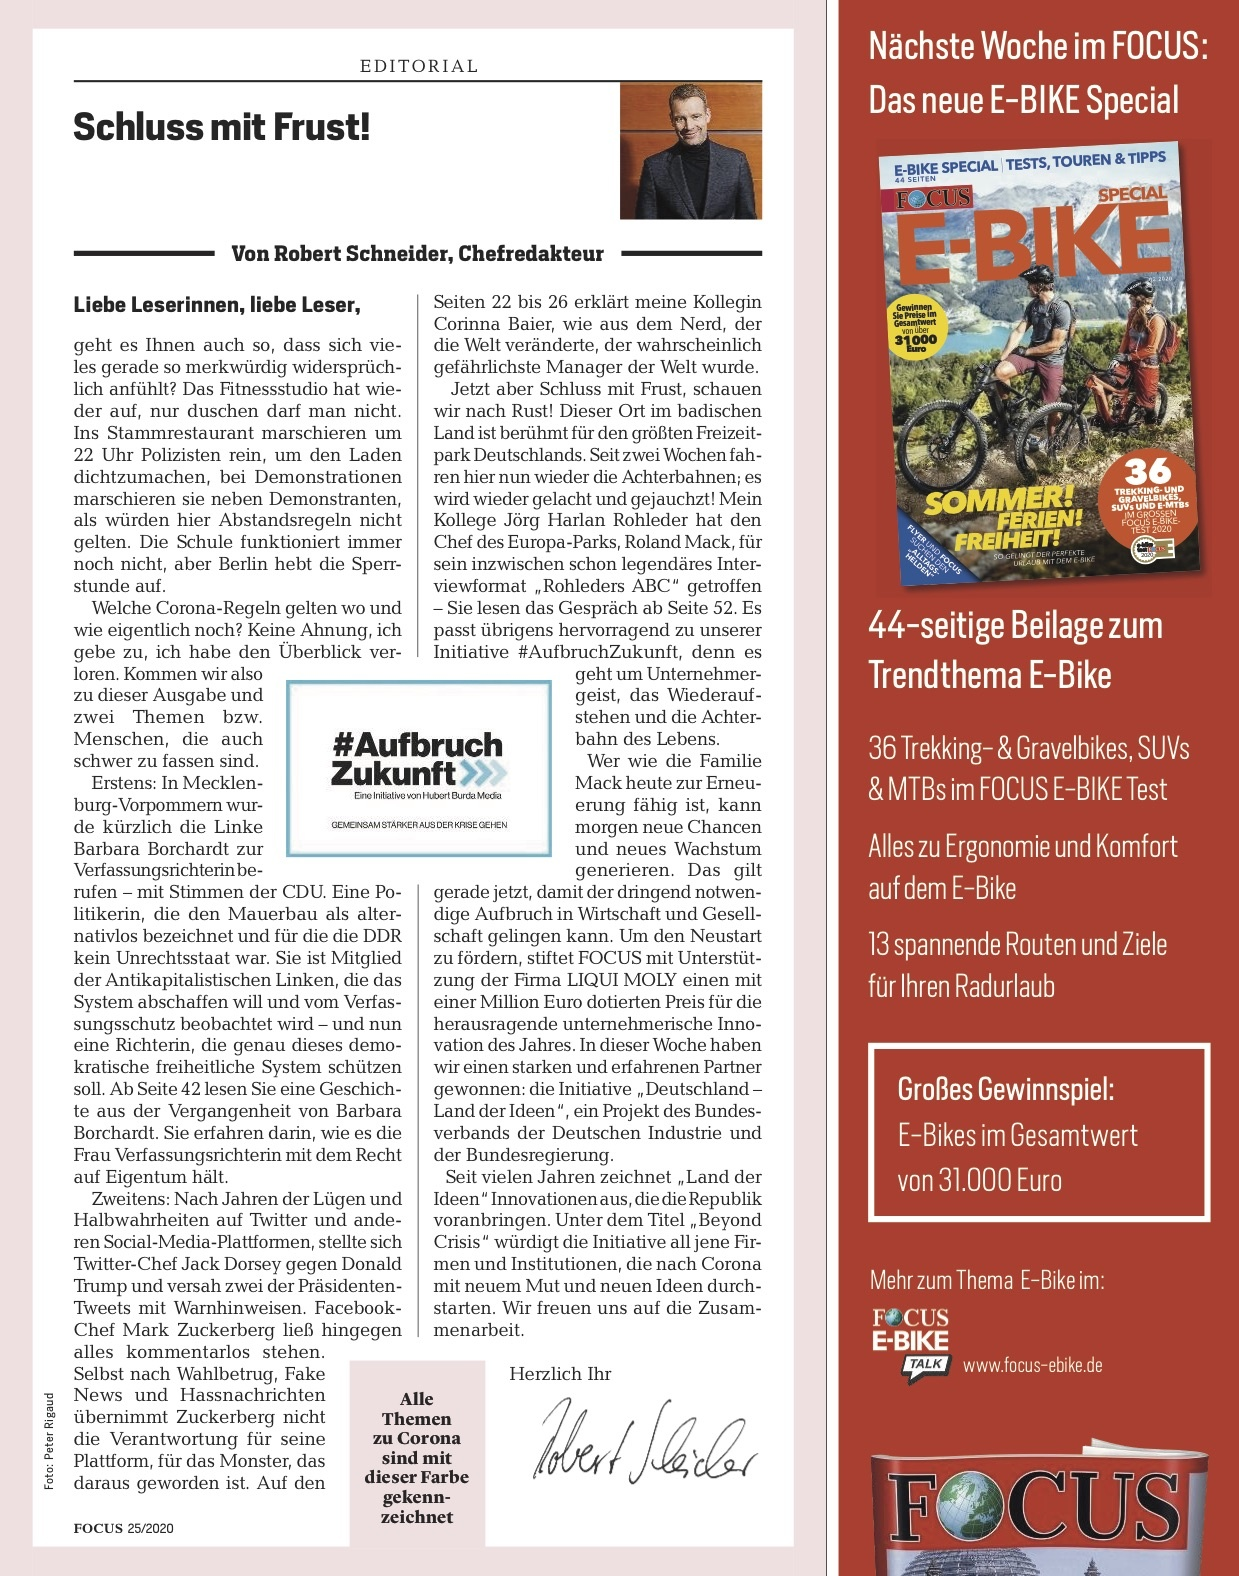 FOCUS Magazin FOCUS Magazin - Chinas Gier